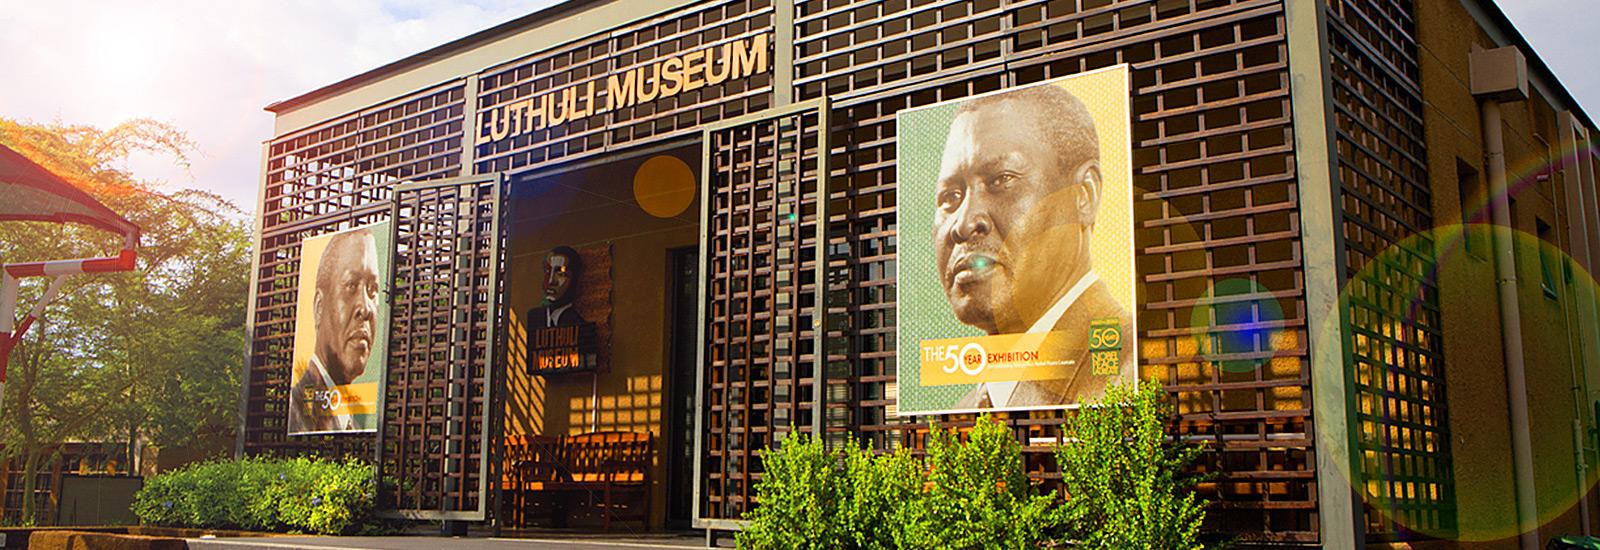 luthuli-museum